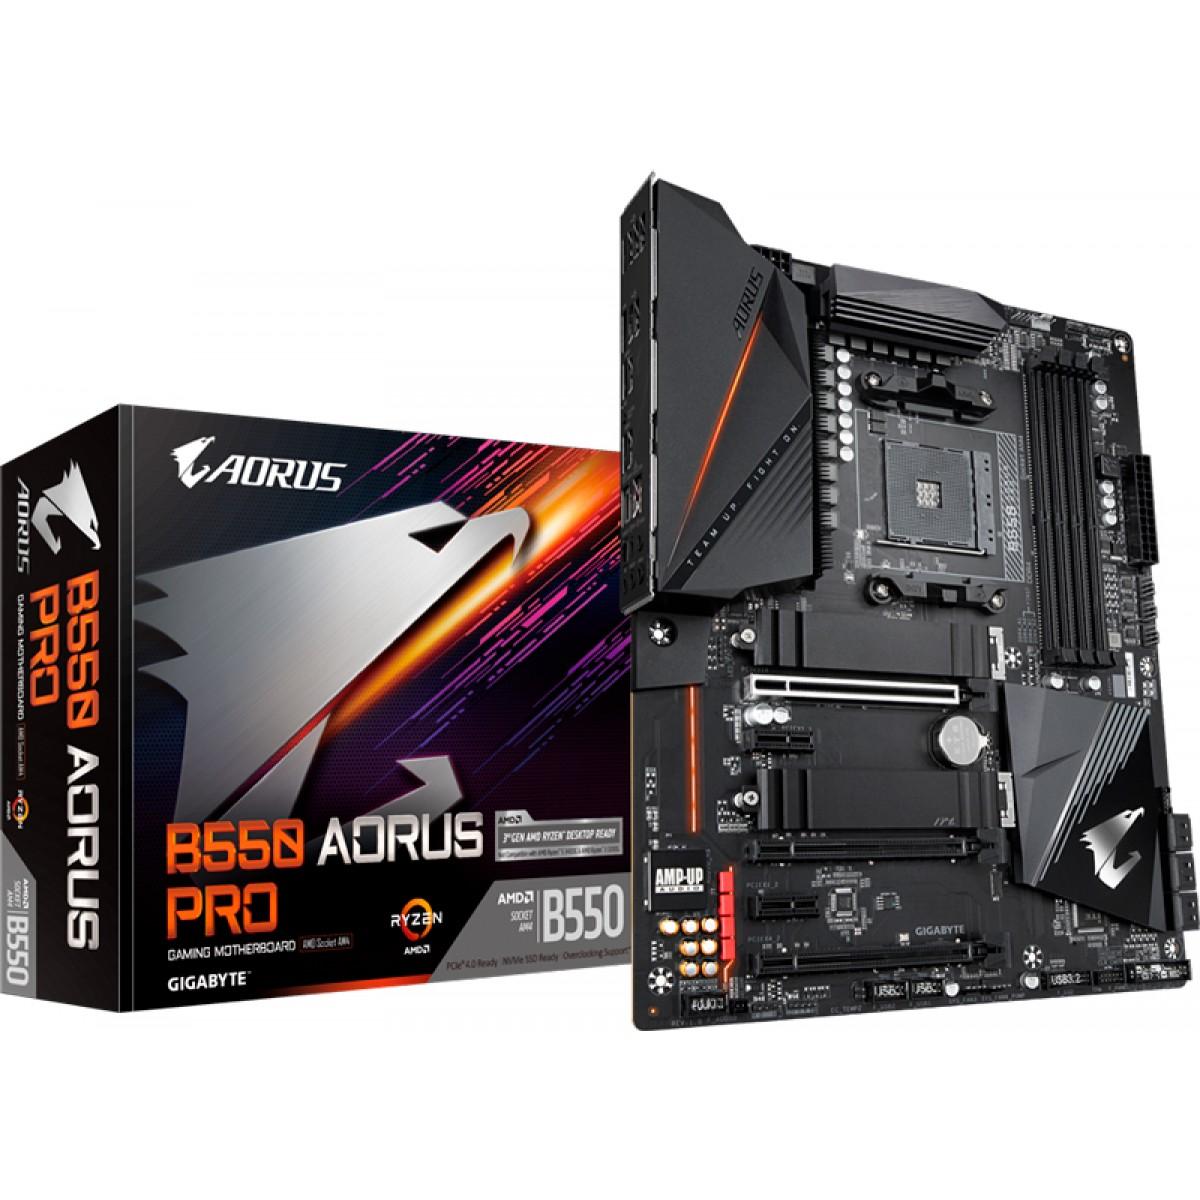 Placa Mãe Gigabyte B550 Aorus Pro, Chipset B550, AMD AM4, ATX, DDR4